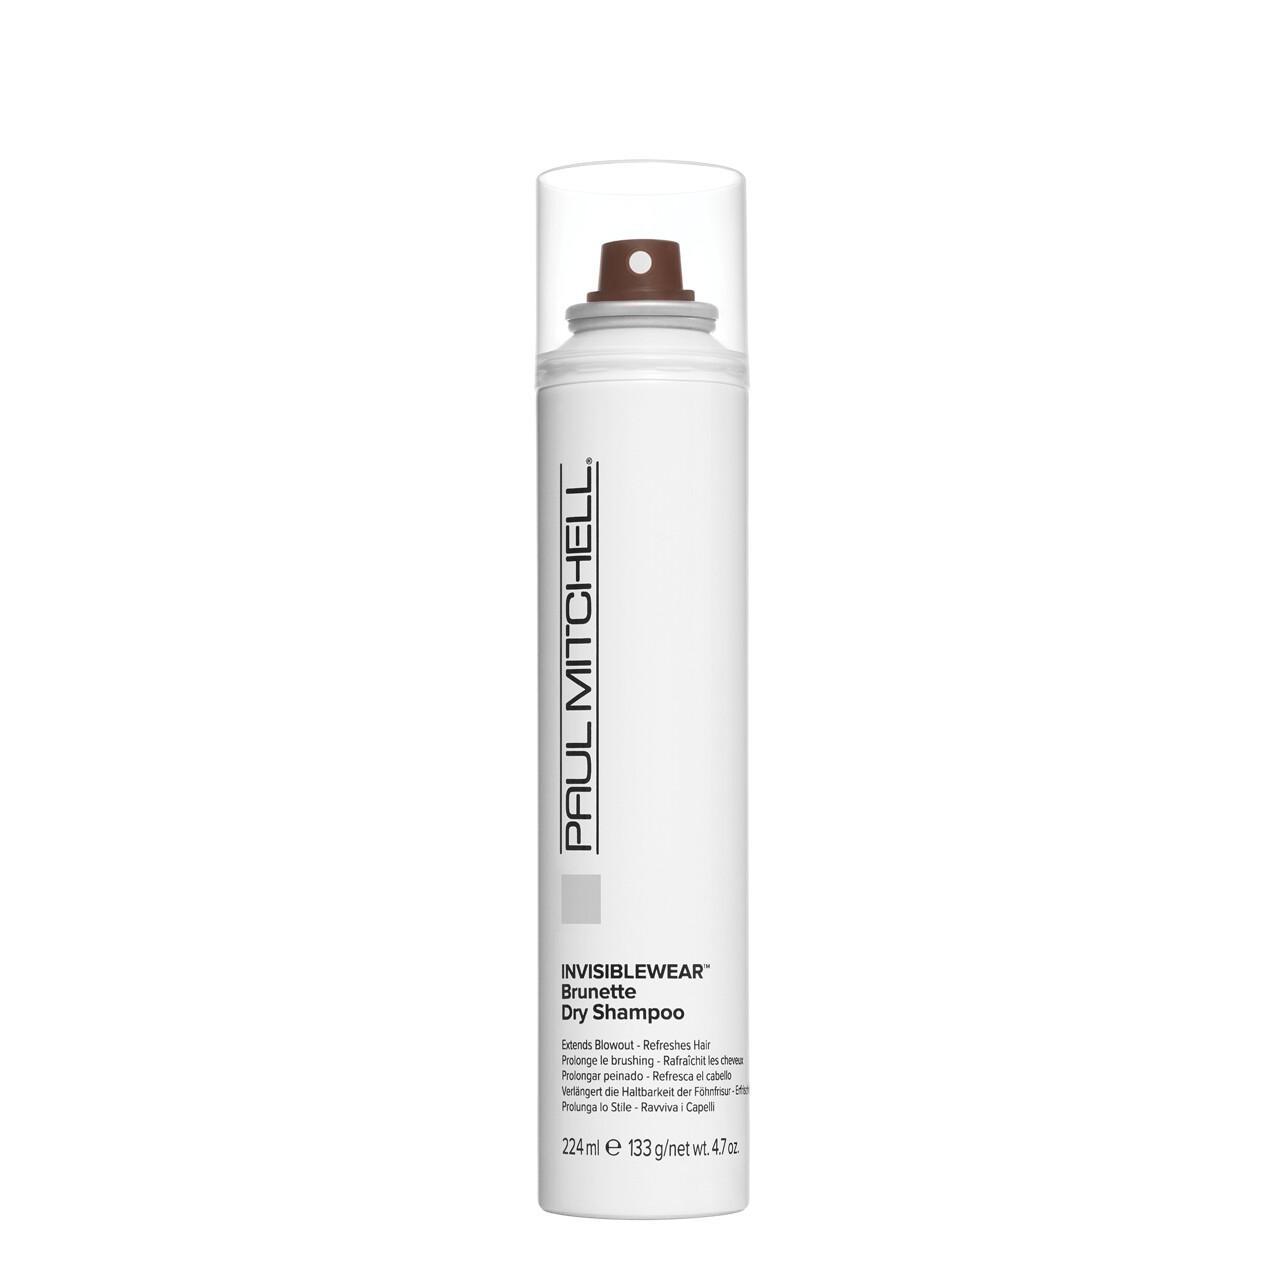 INVISIBLEWEAR Brunette Dry Shampoo 224ml